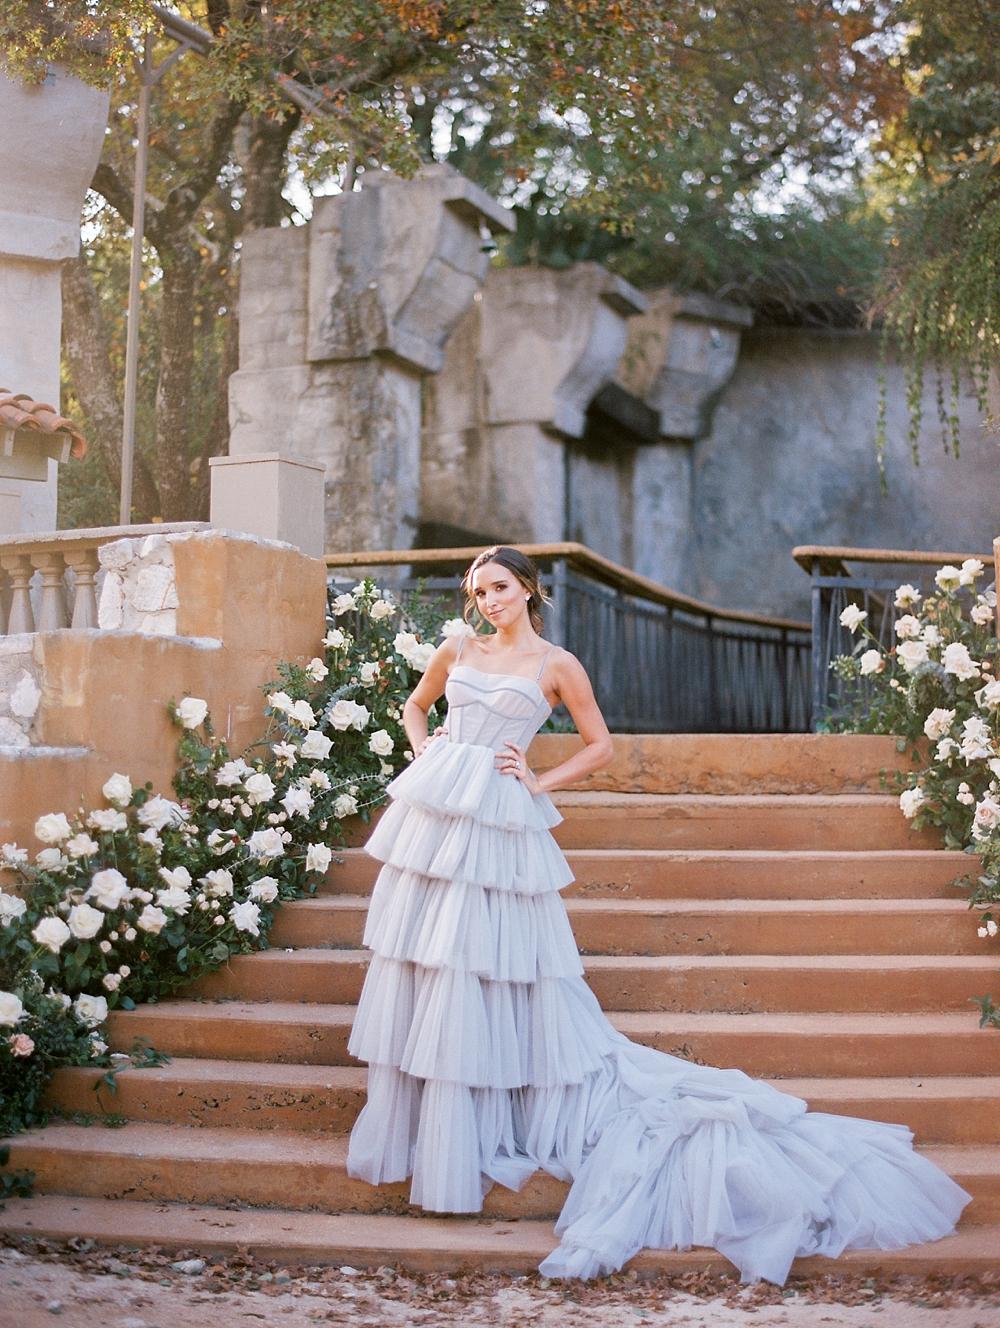 kristin-la-voie-photography-Austin-Wedding-Photographer-Villa-Antonia-111